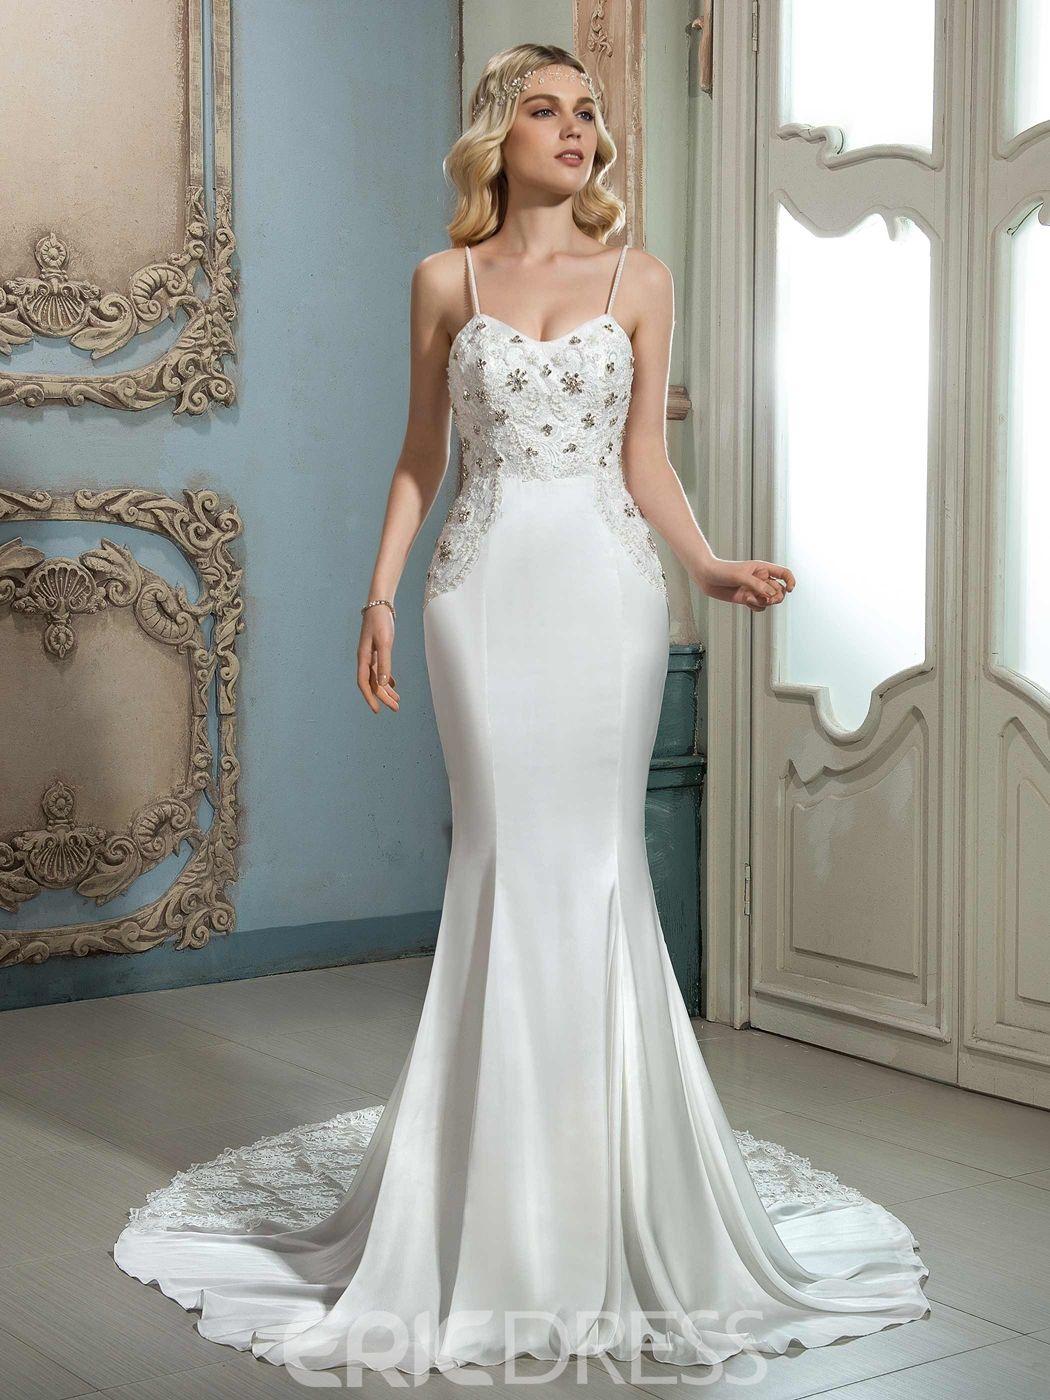 Amazing Spaghetti Straps Hollow Mermaid Wedding Dress